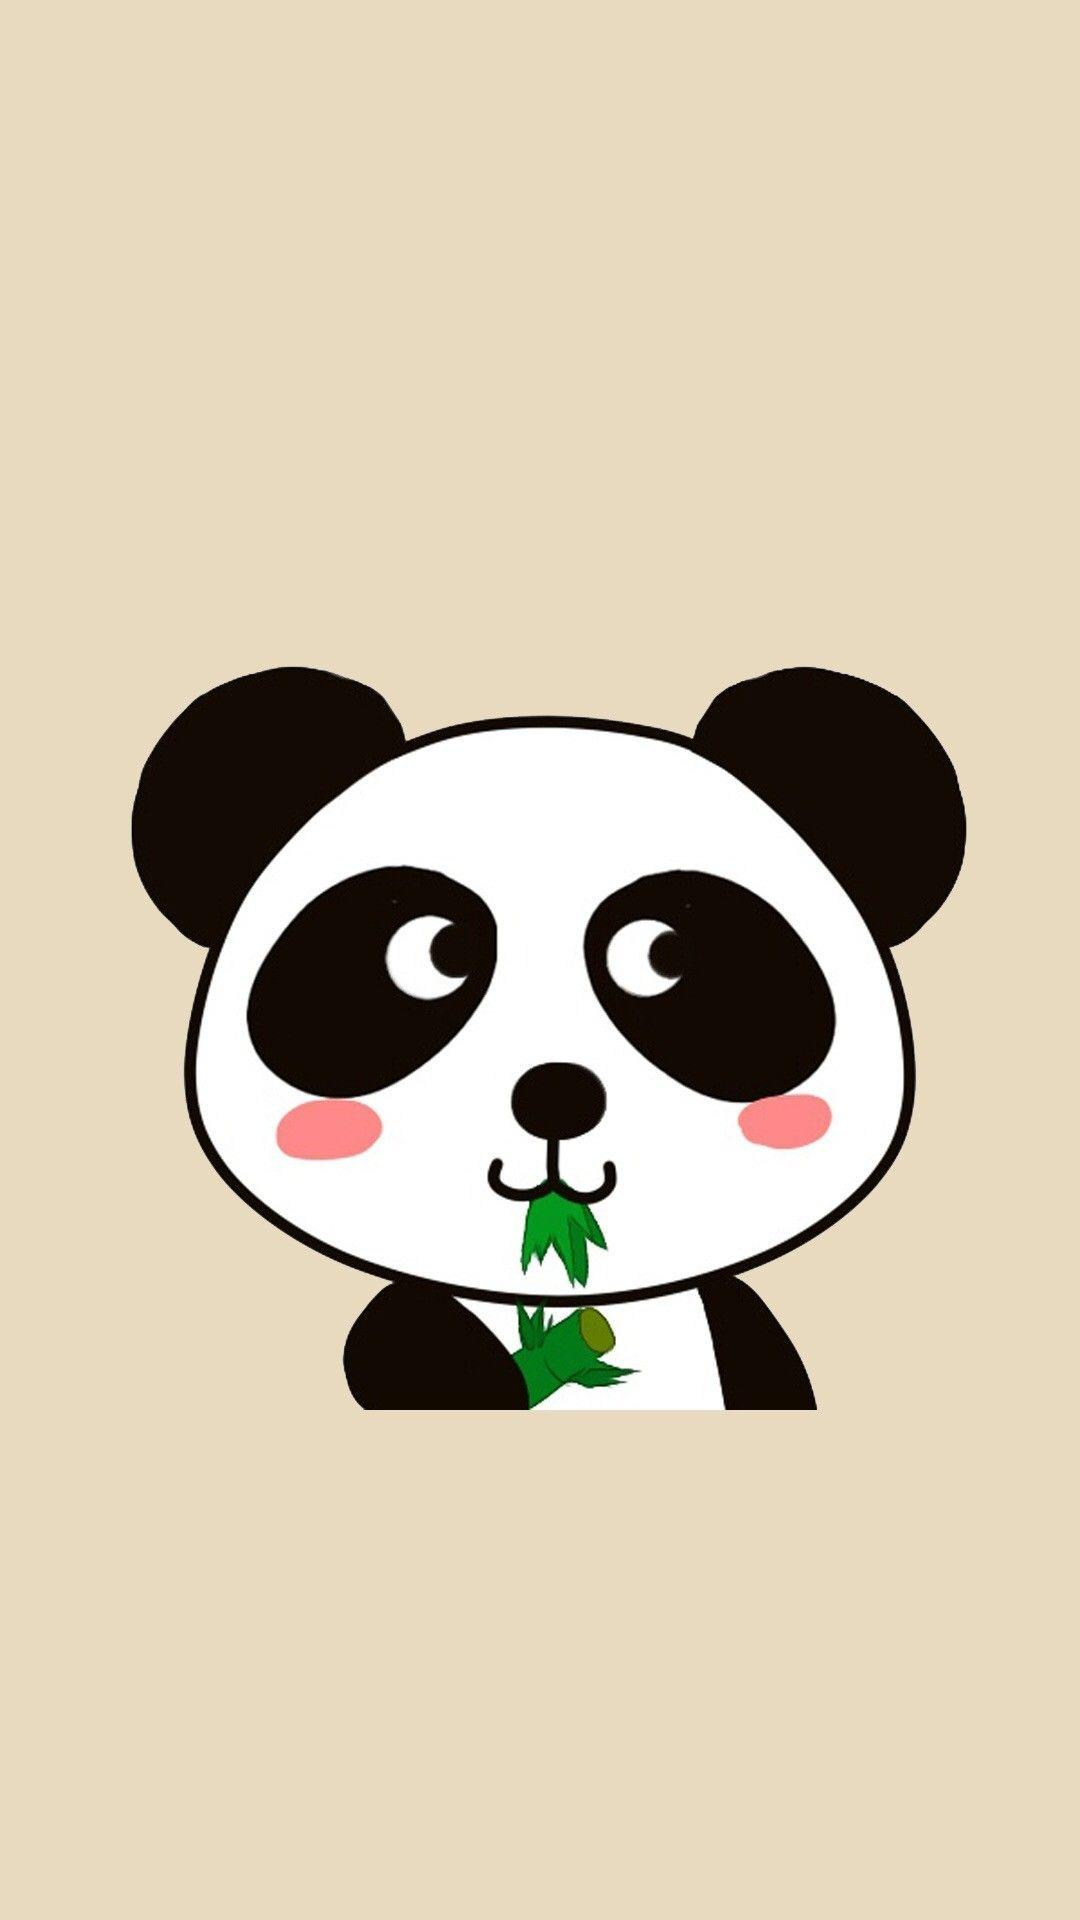 Kawaii Tare Panda Wallpaper ·①